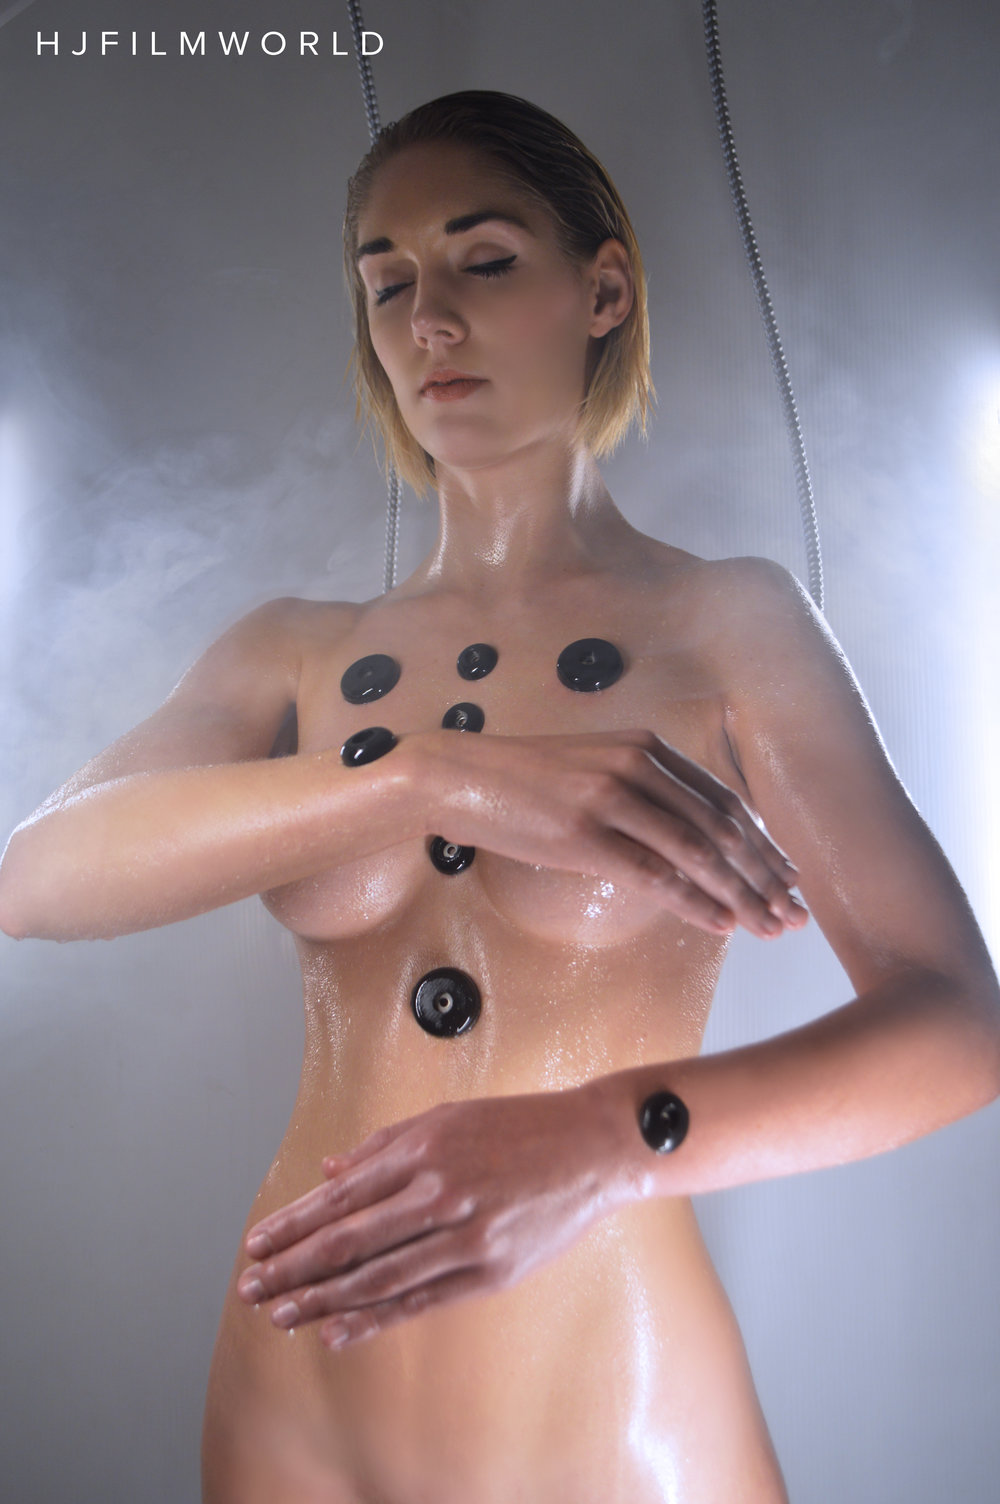 Model: Lyn Hesper